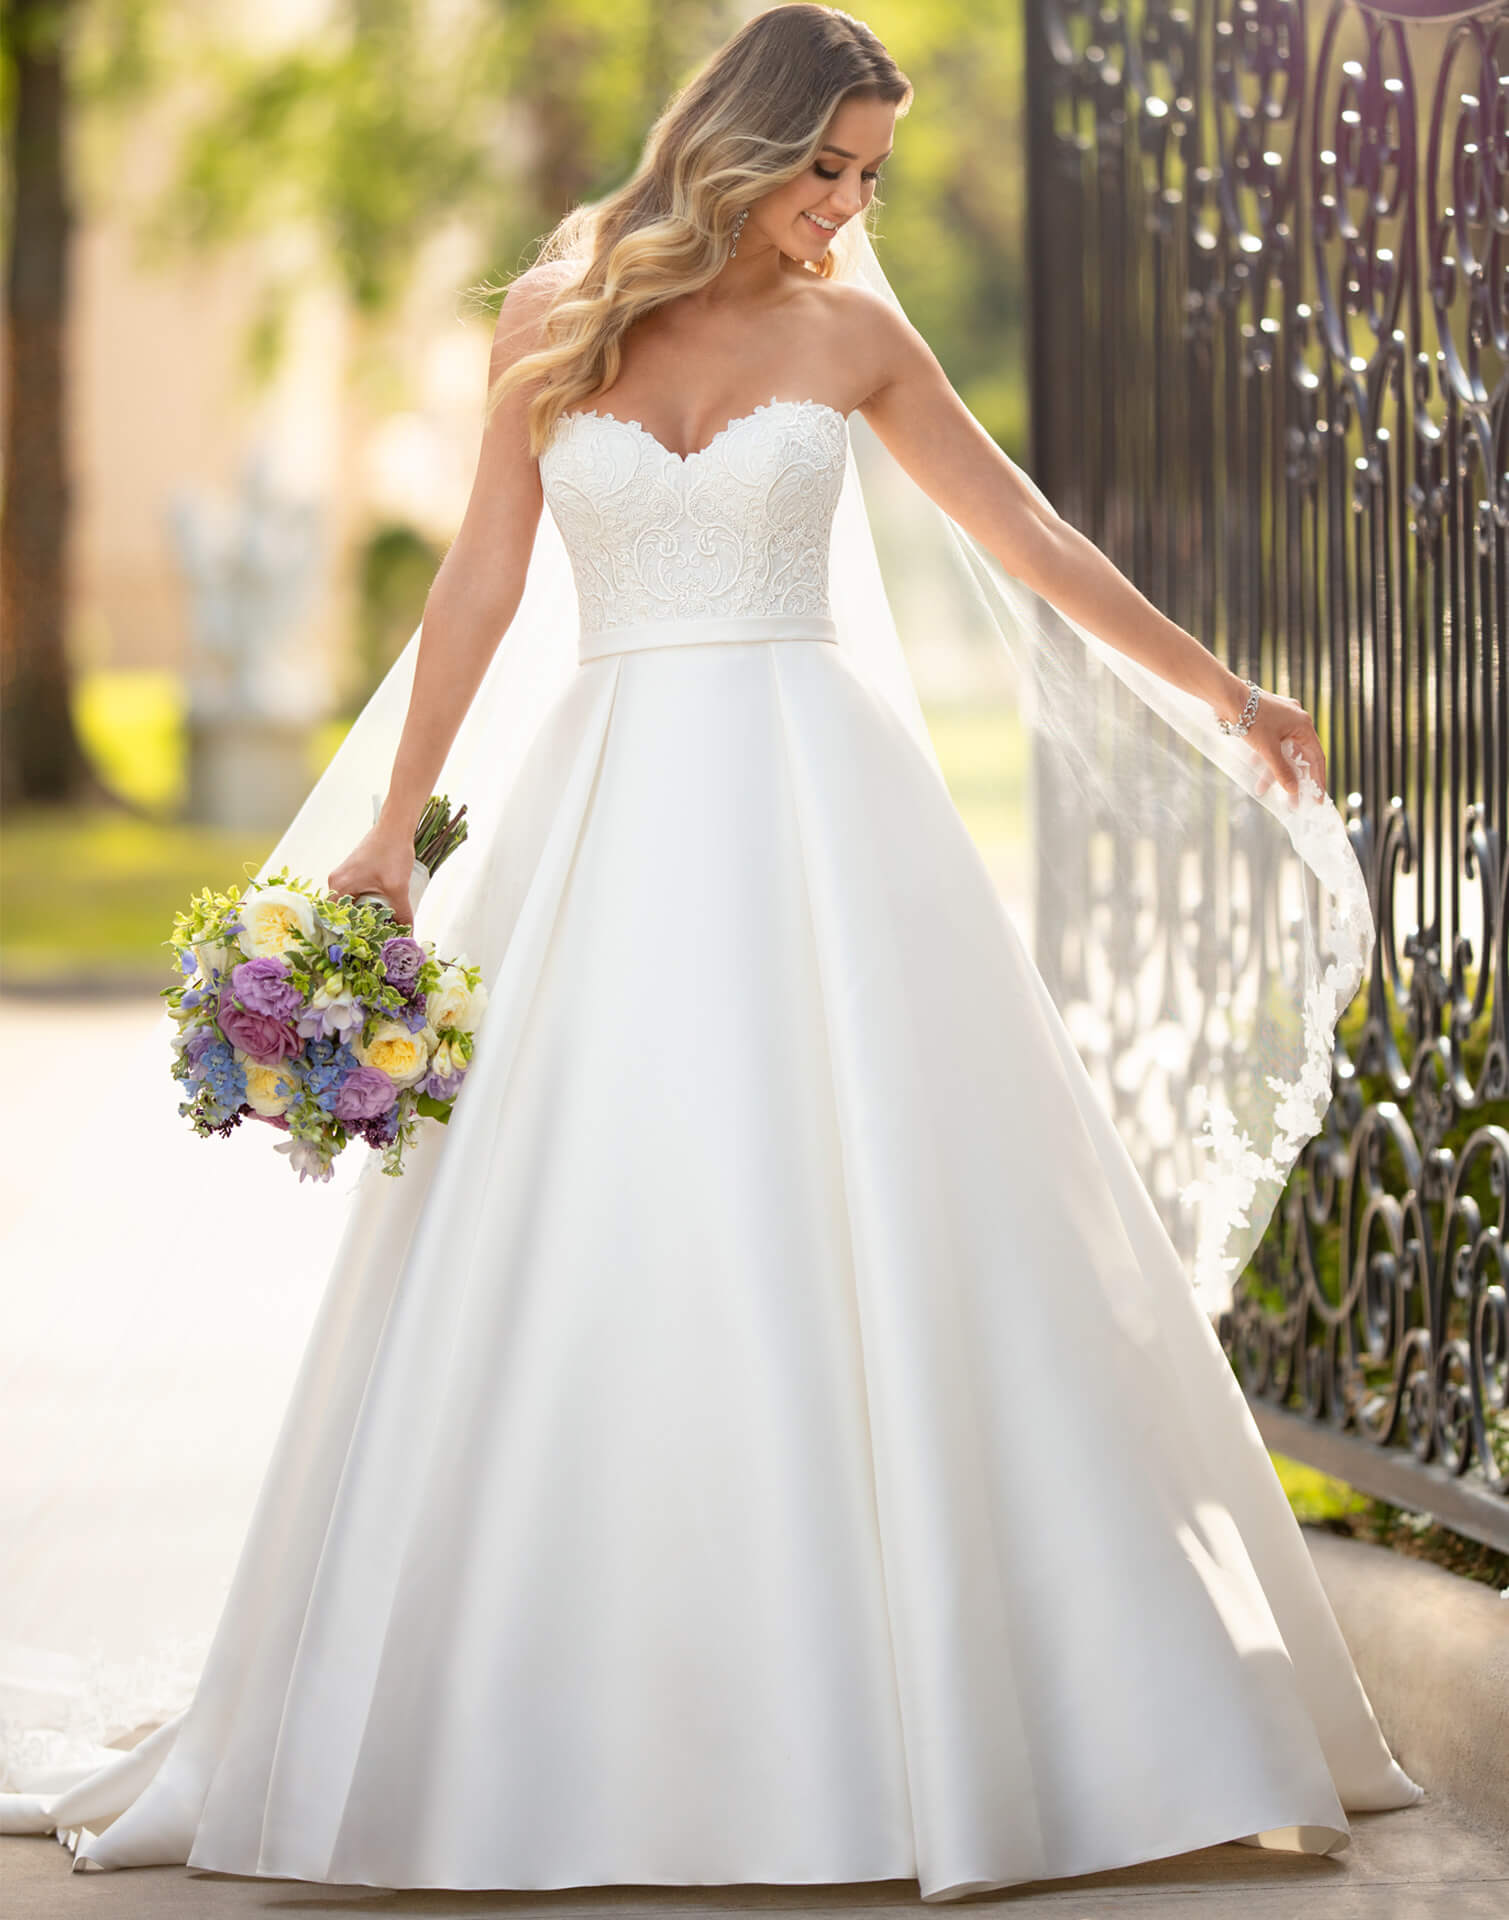 6763 – Stella York Wedding Dress Collection – Front View